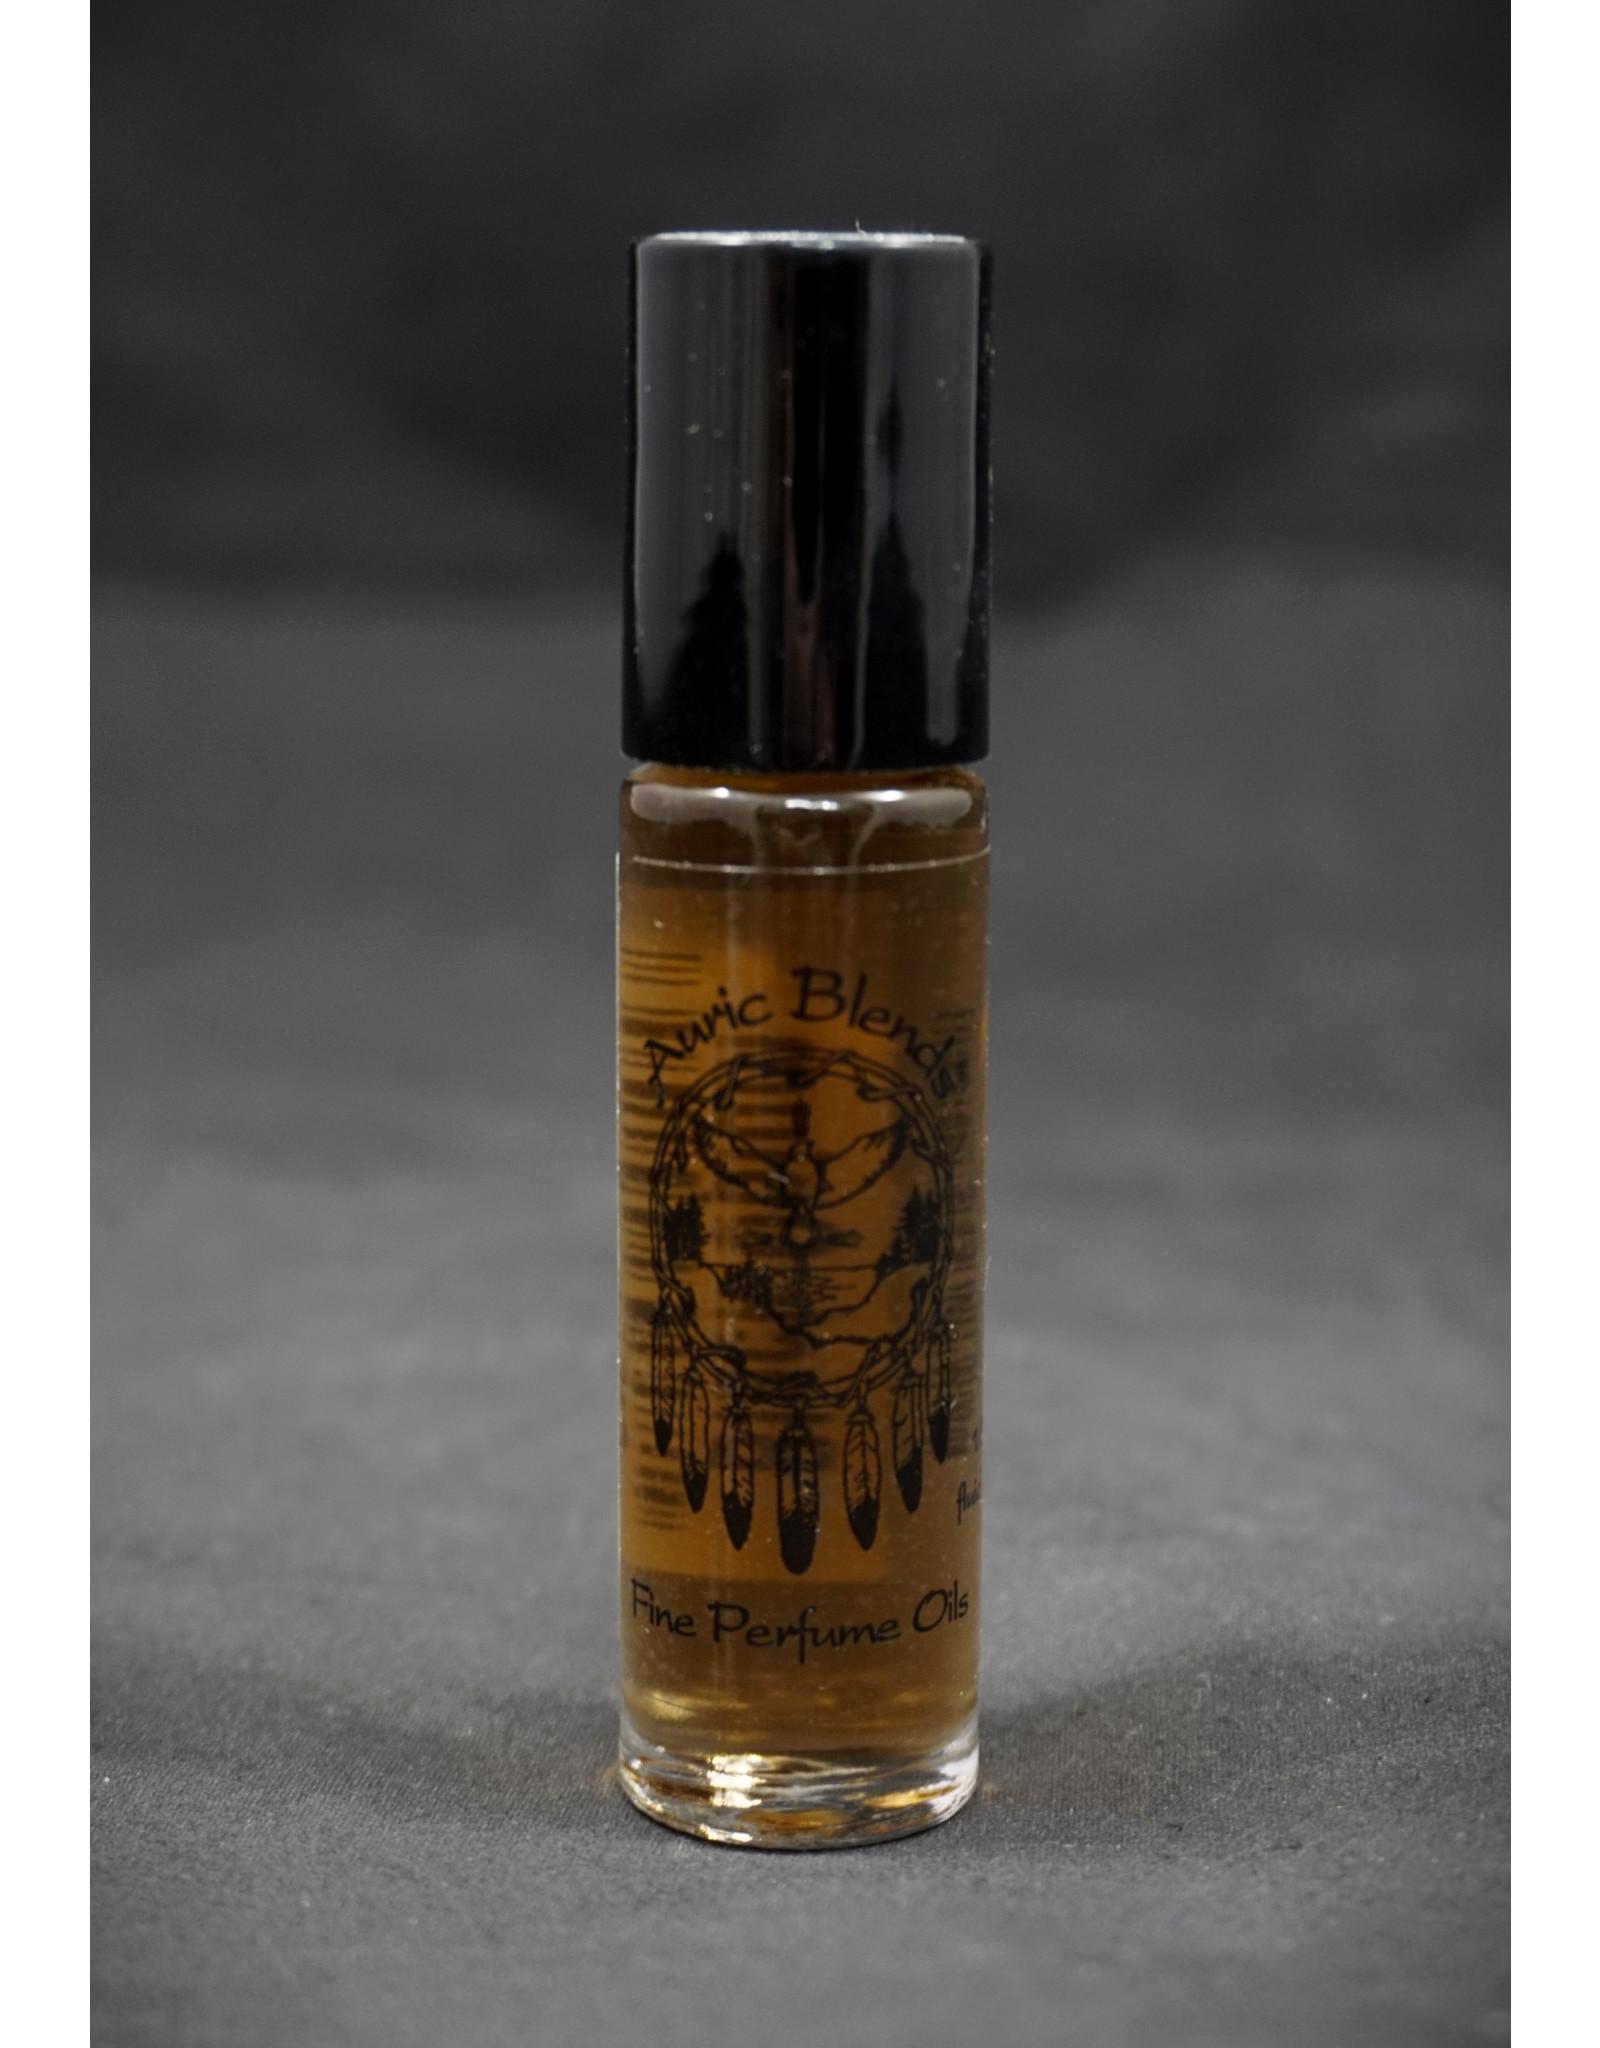 Auric Blends Auric Blends Roll On Perfume Oil - Black Opium